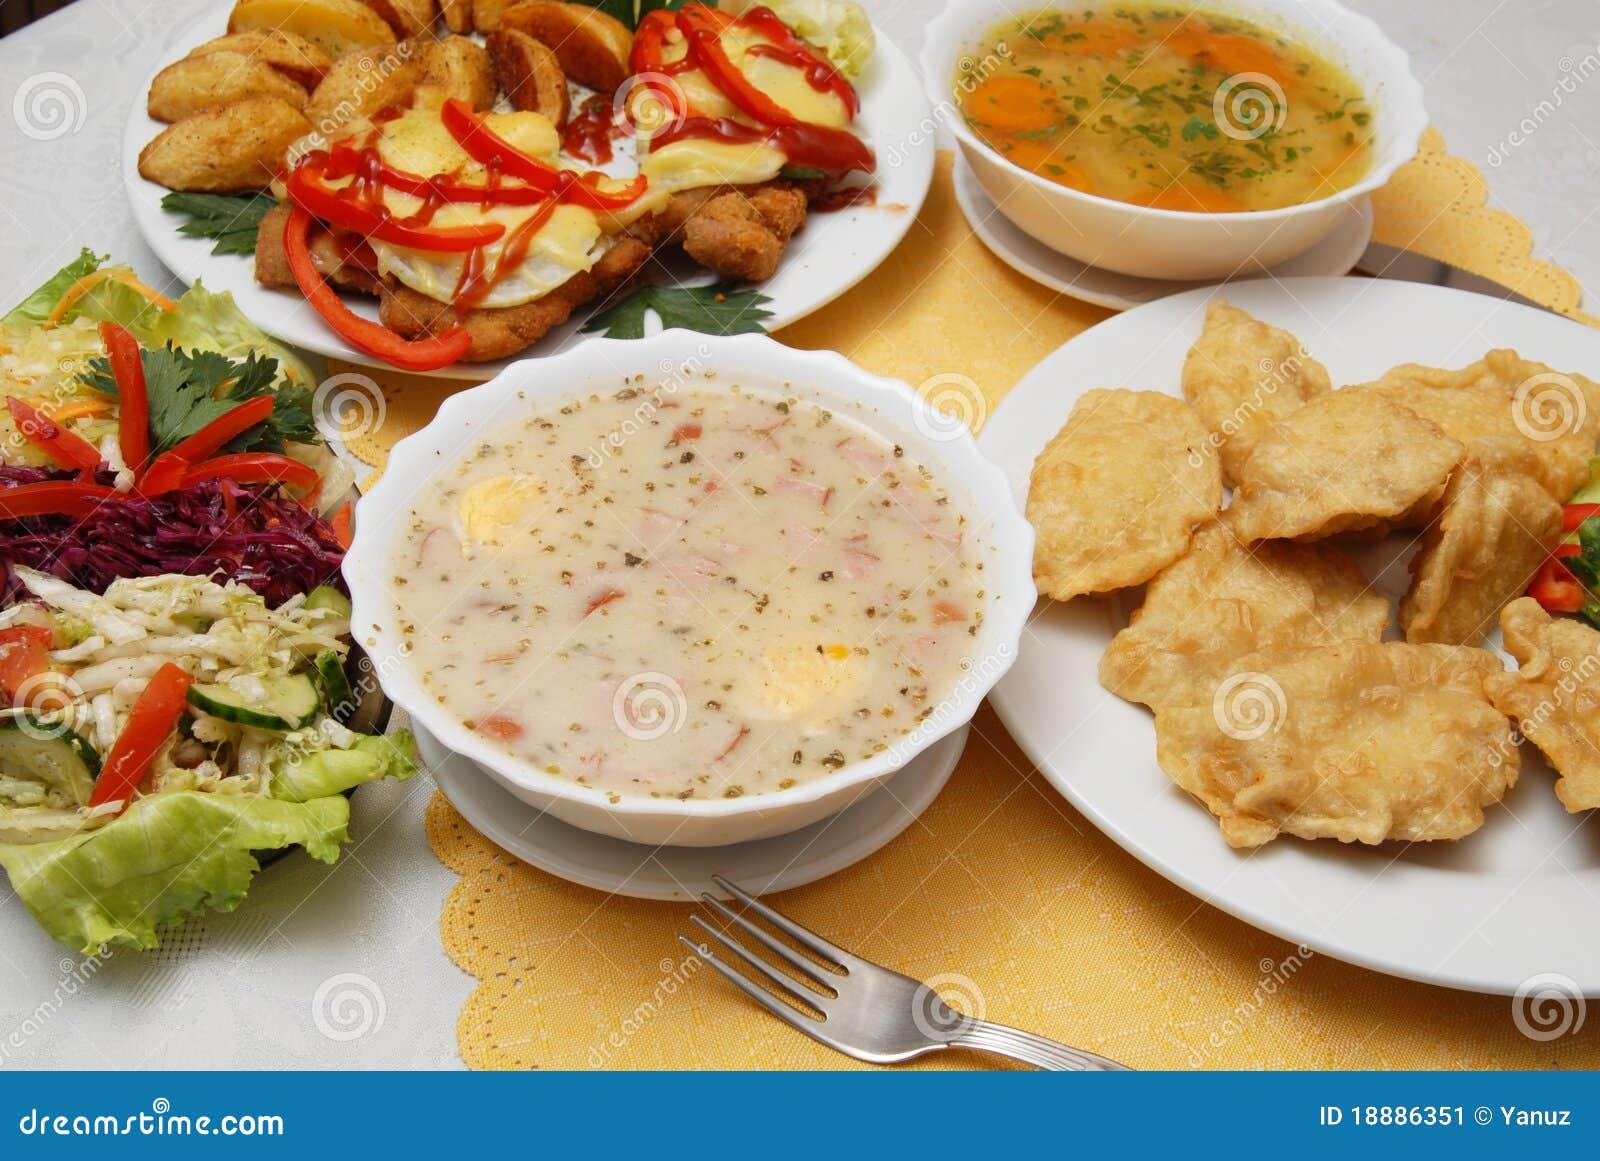 Polish Food Stock Image Image Of Sour Dine Thin Cook 18886351